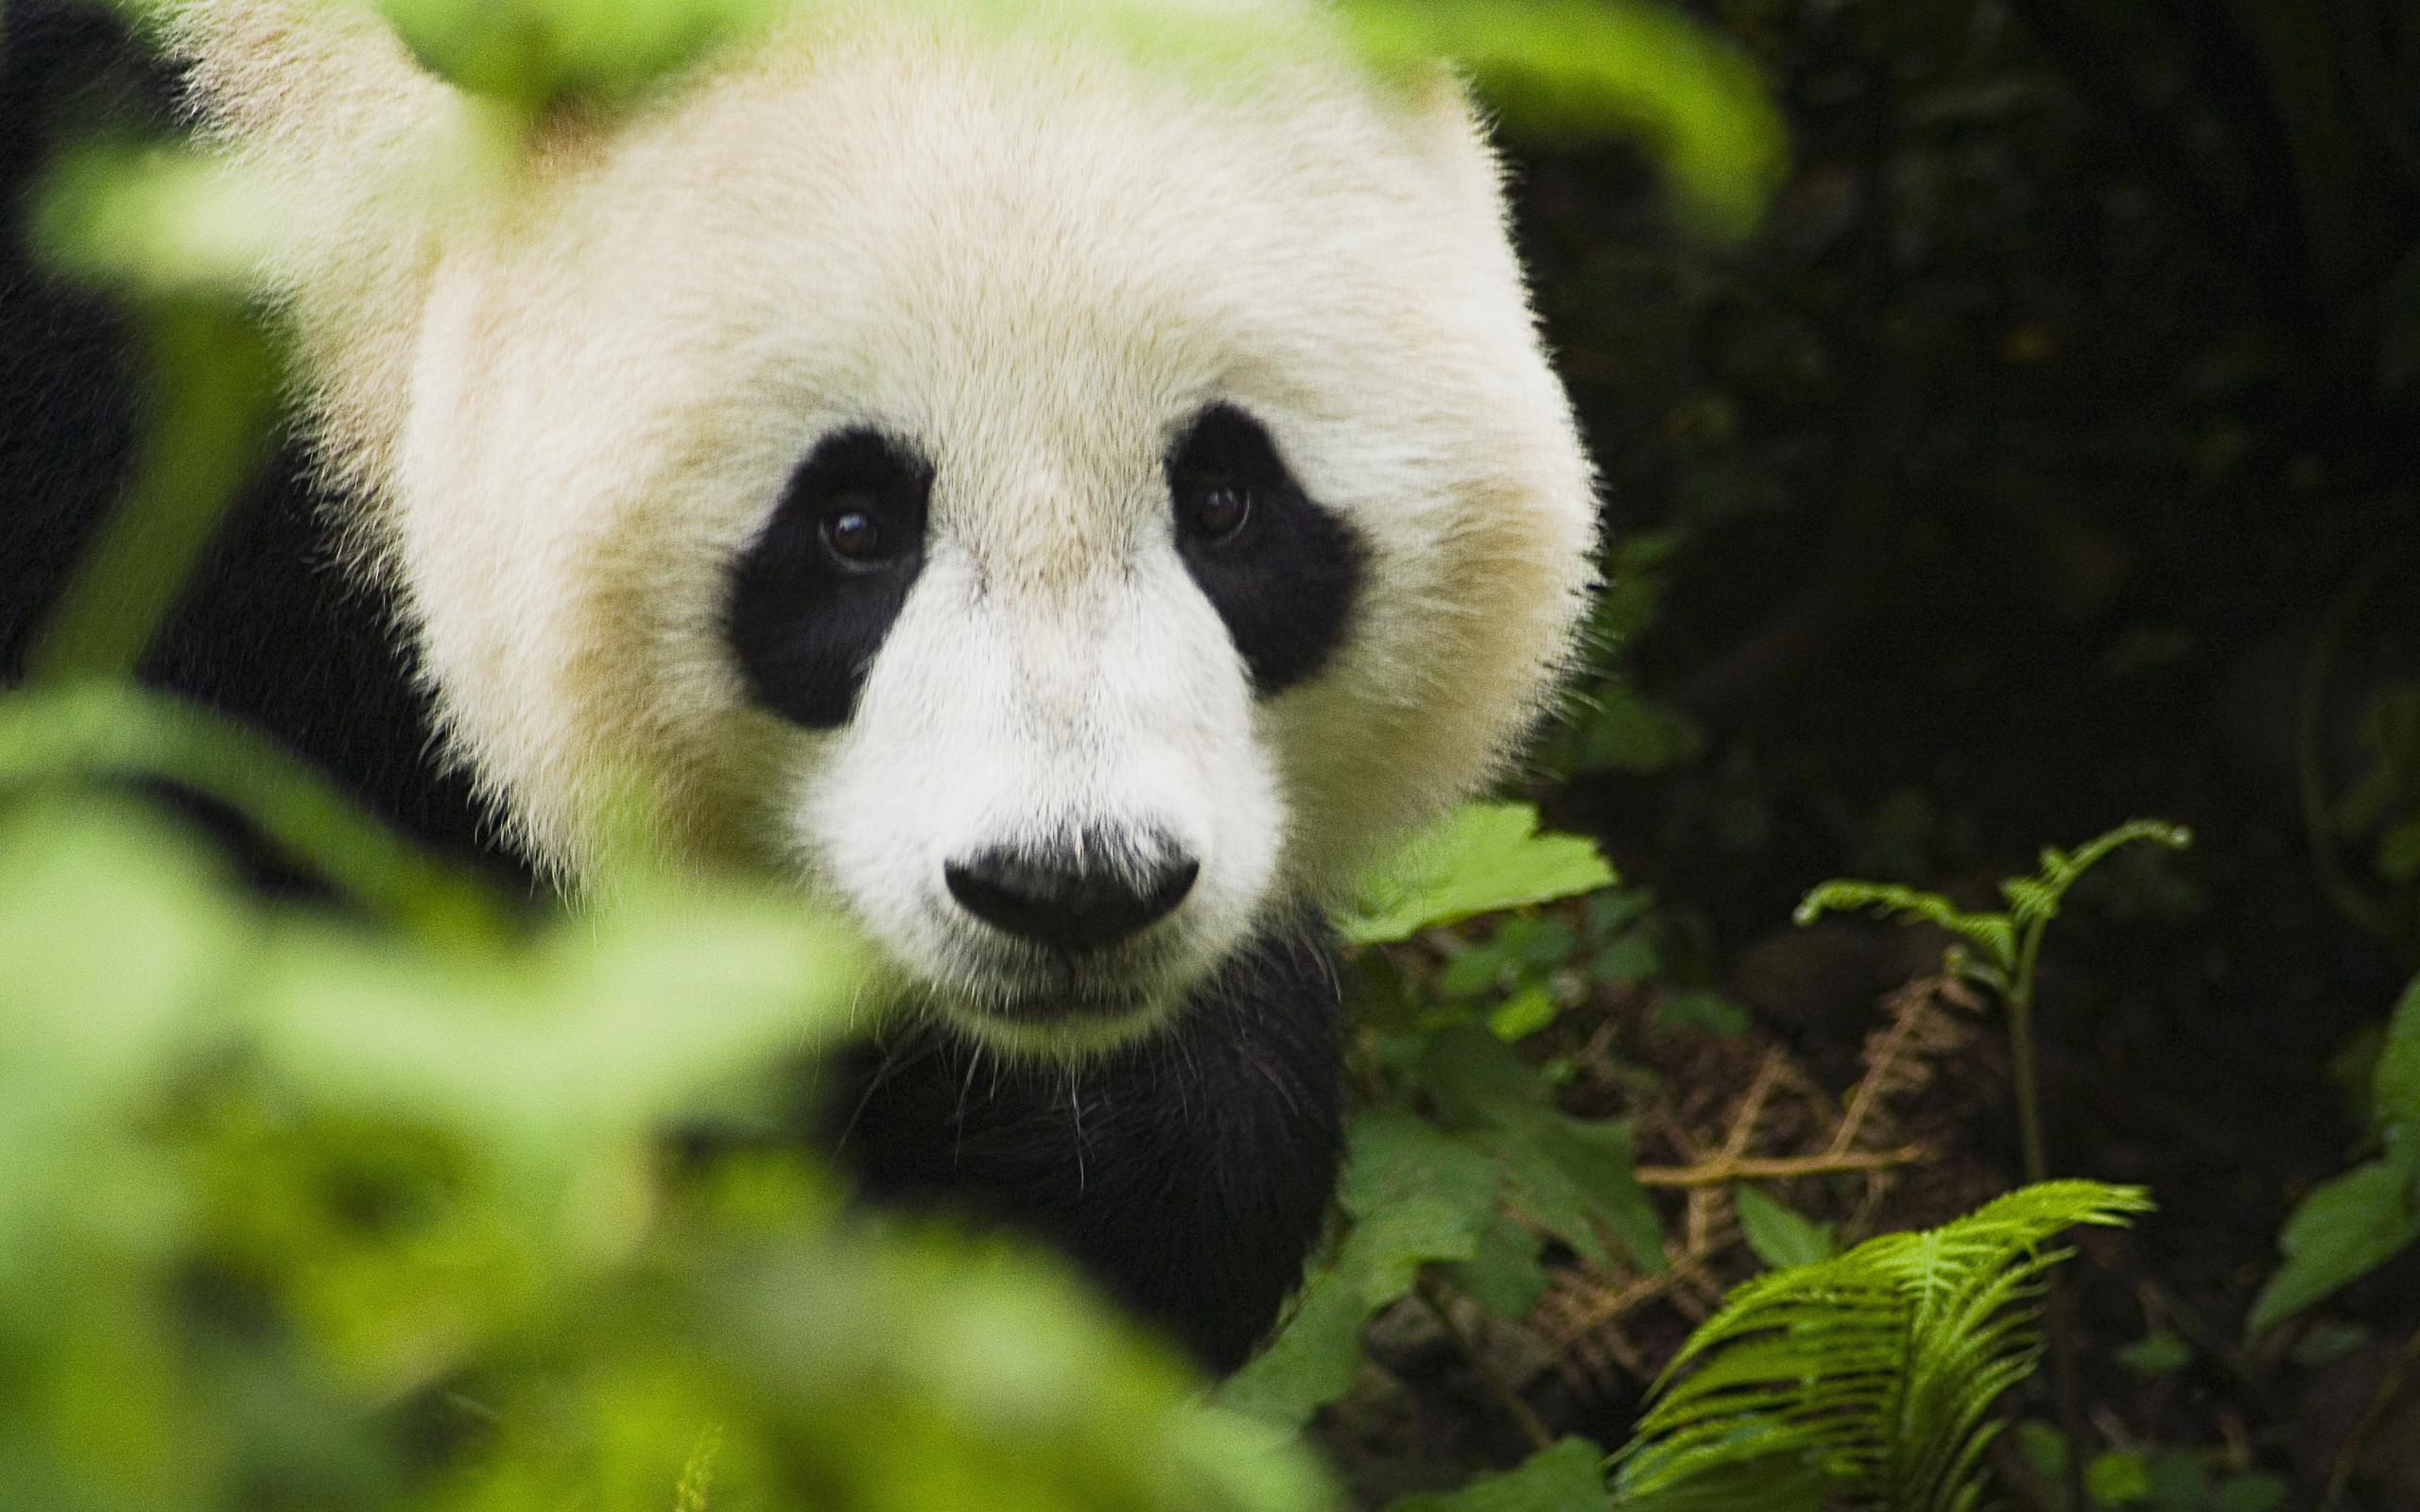 Cute Panda Face Wallpaper IPhone Wallpaper | WallpaperLepi